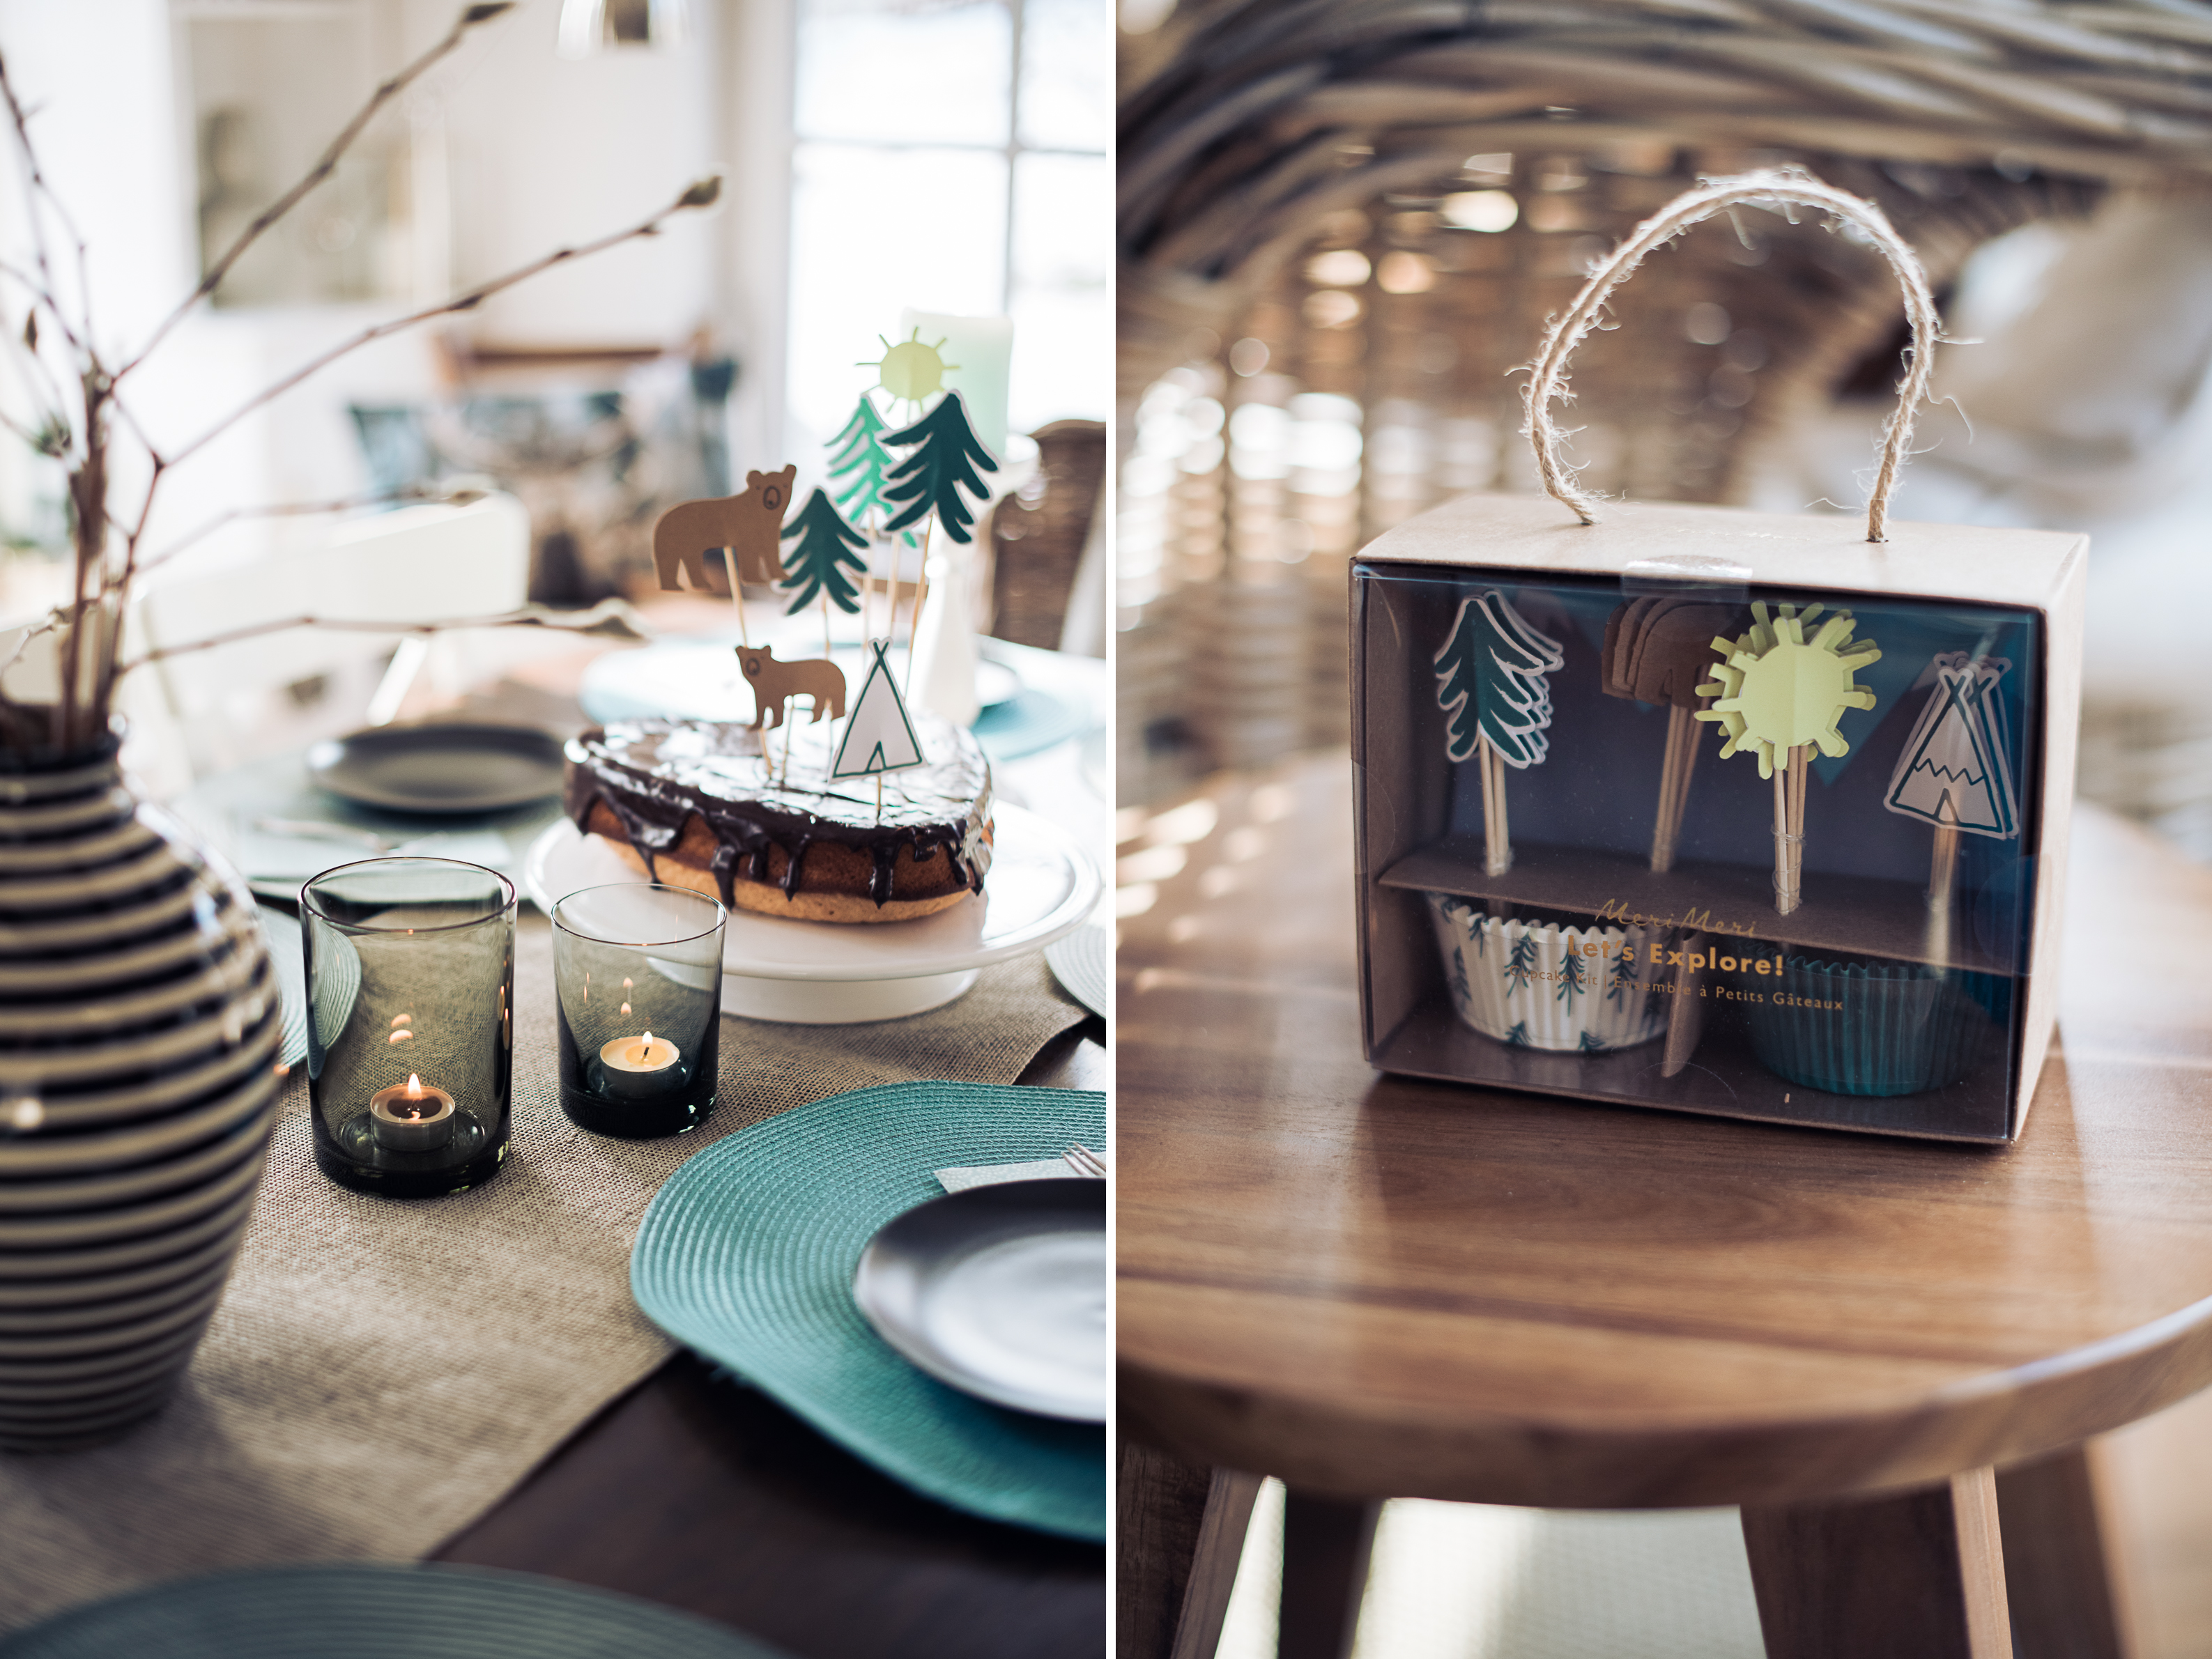 10 in worten z e h n seelensachen. Black Bedroom Furniture Sets. Home Design Ideas